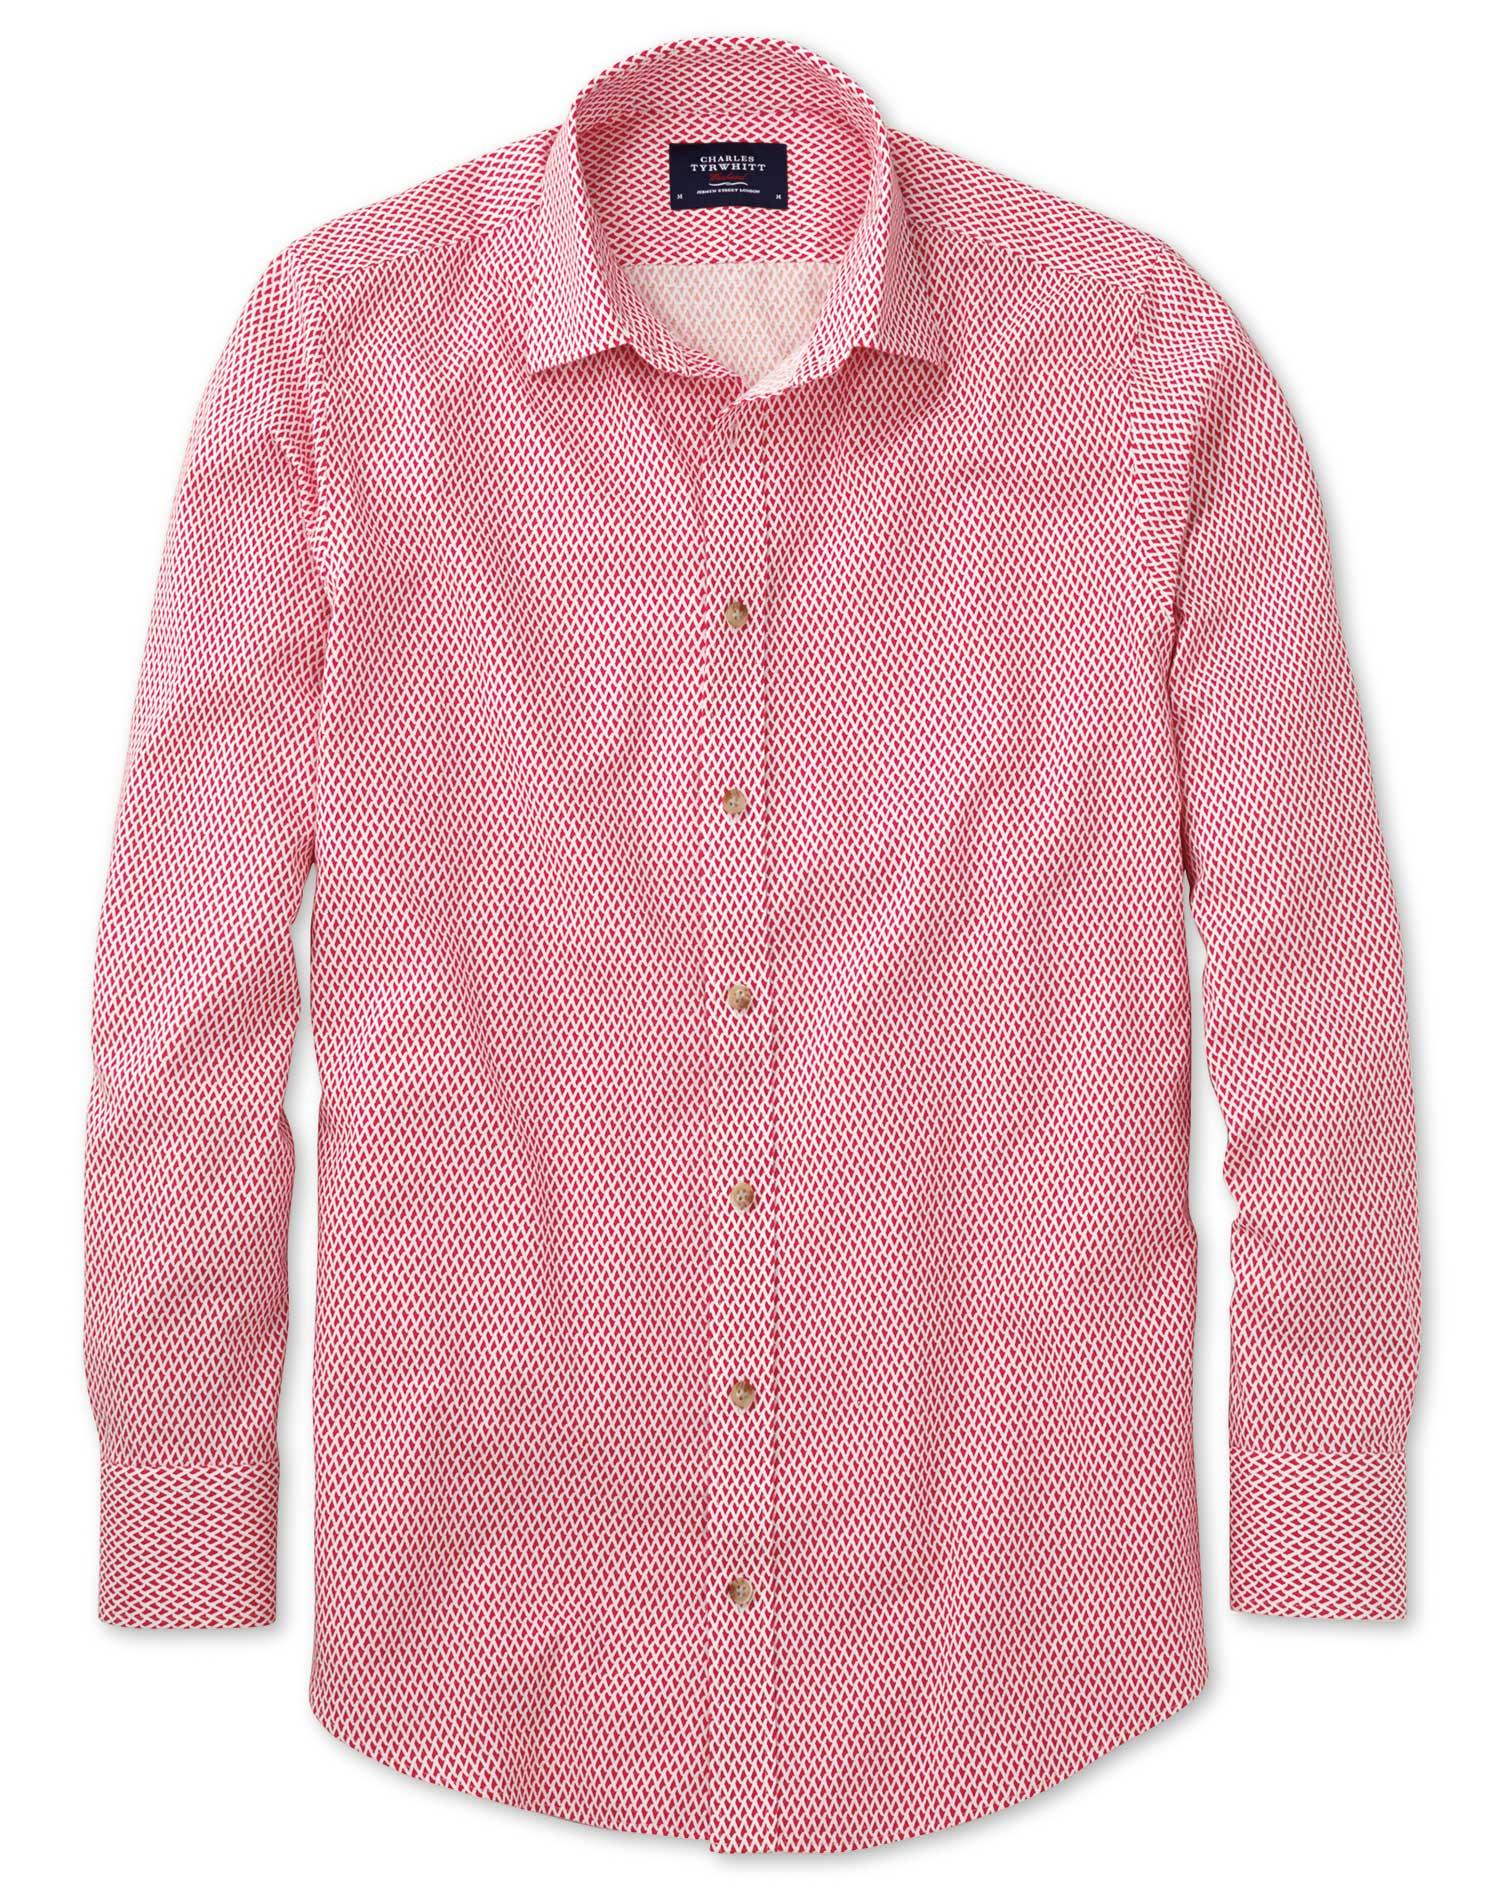 Slim Fit Coral and White Print Shirt Single Cuff Size Medium by Charles Tyrwhitt